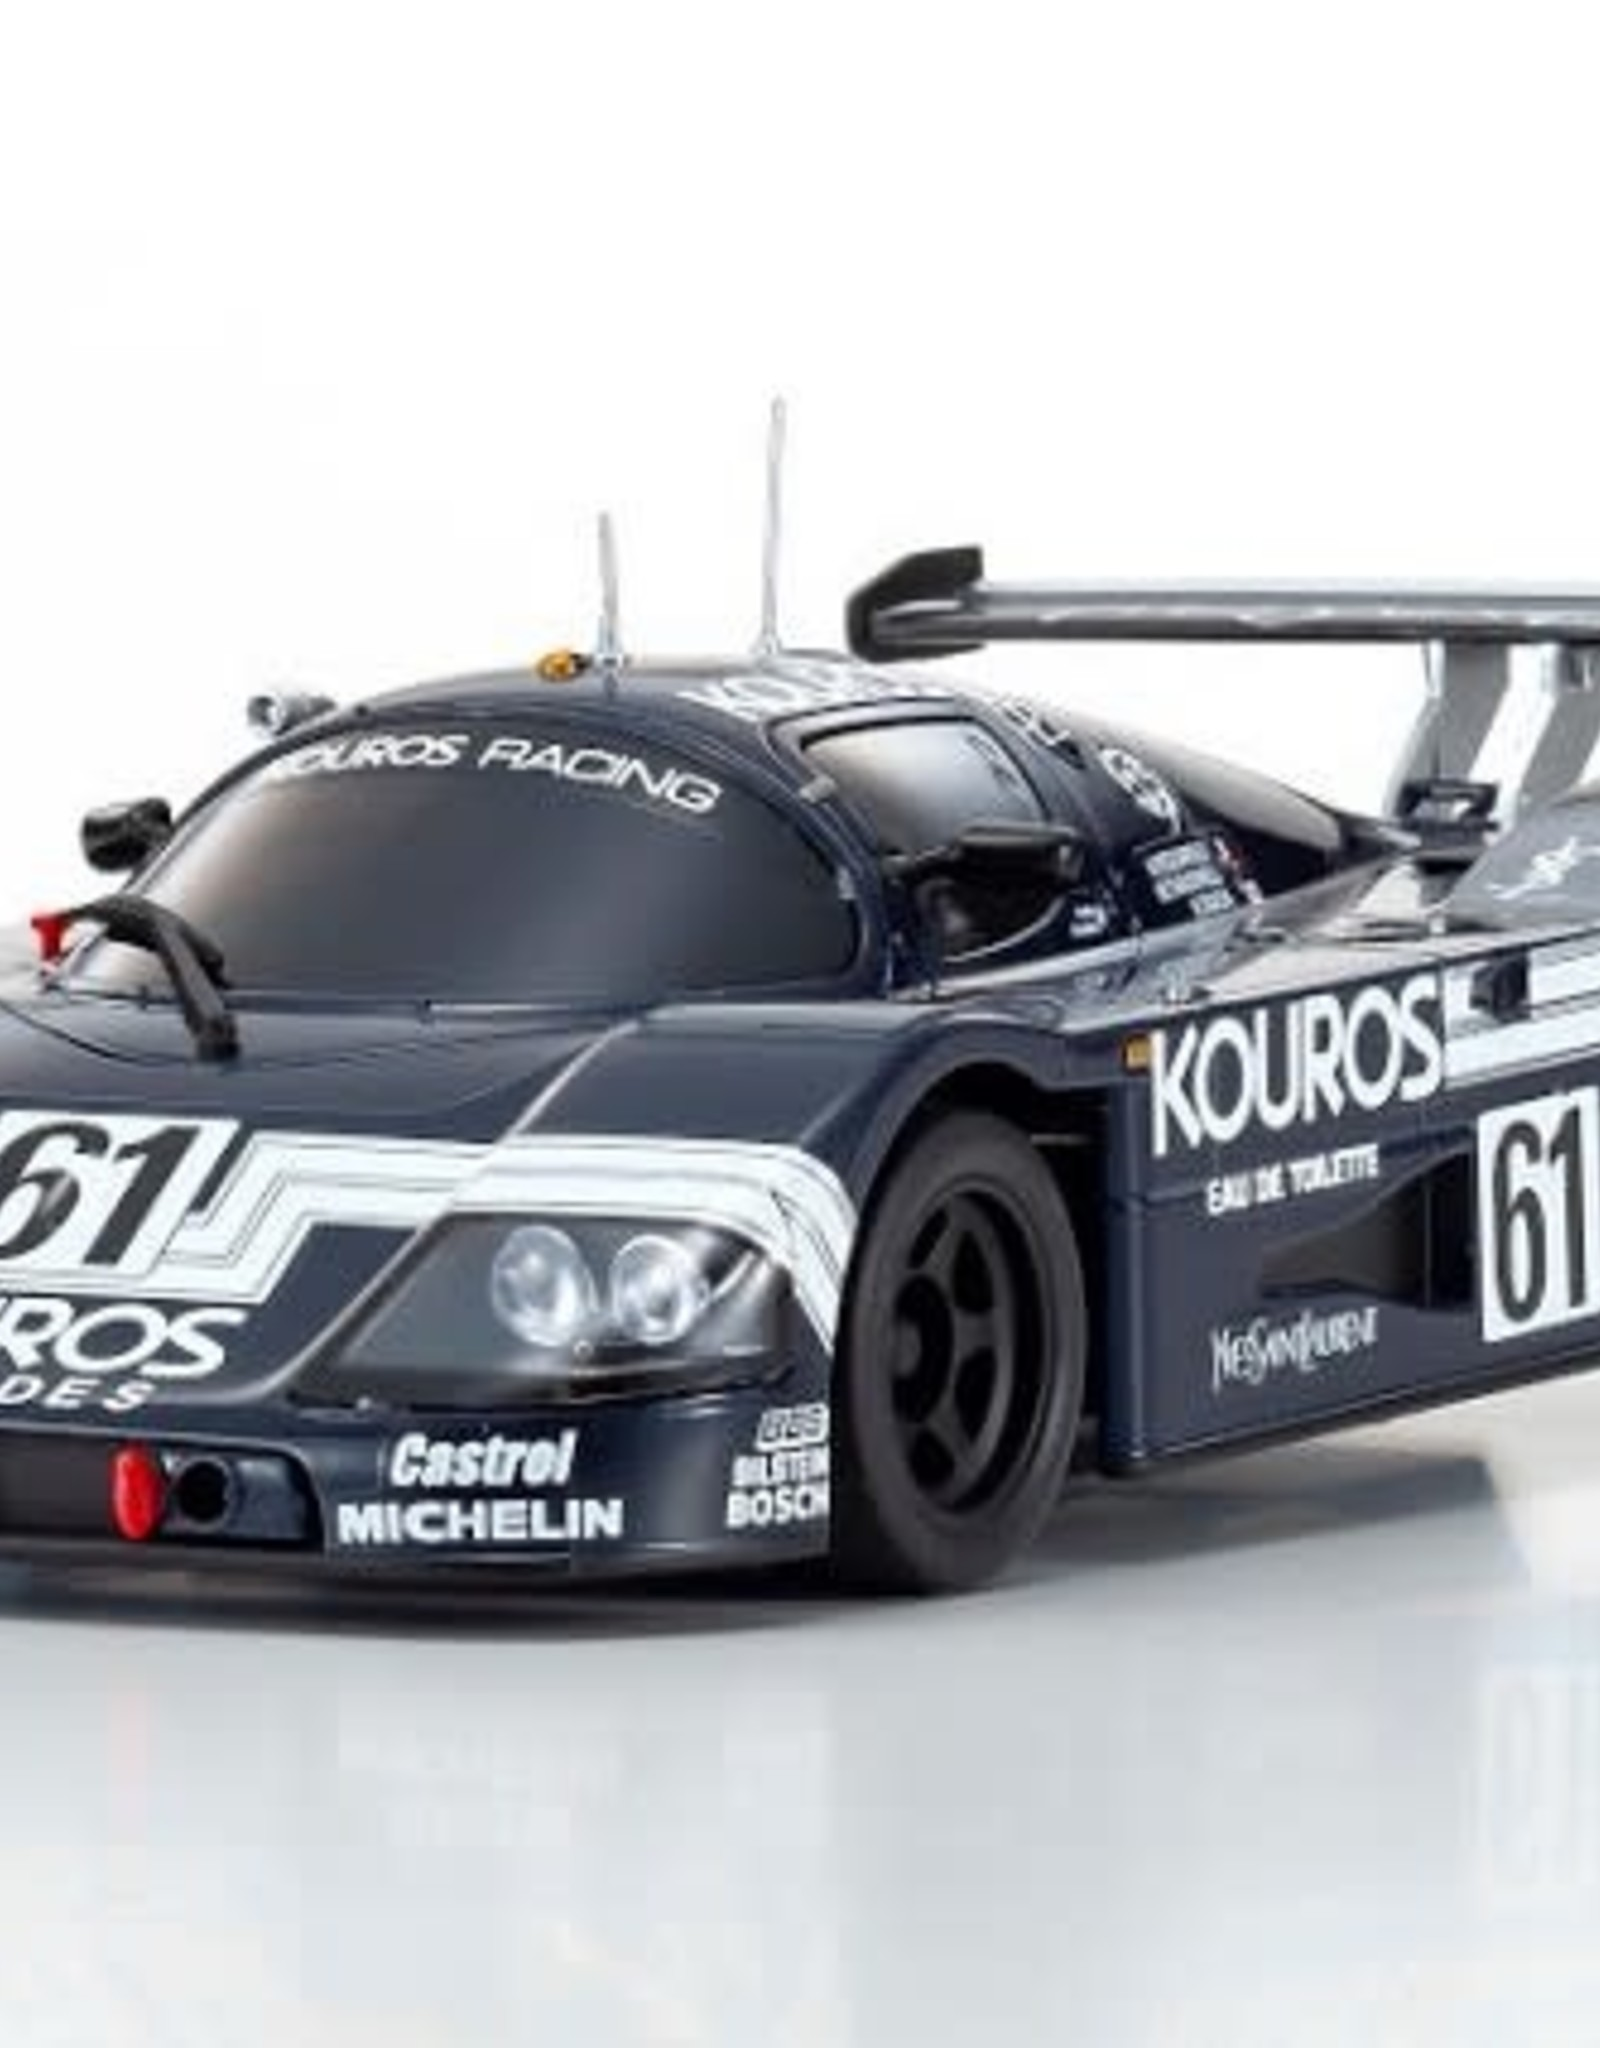 KYOSHO KYO32327KR MINI-Z RWD Sauber-Mercedes C9 No. 61 LM 1987 MR-03 Readyset